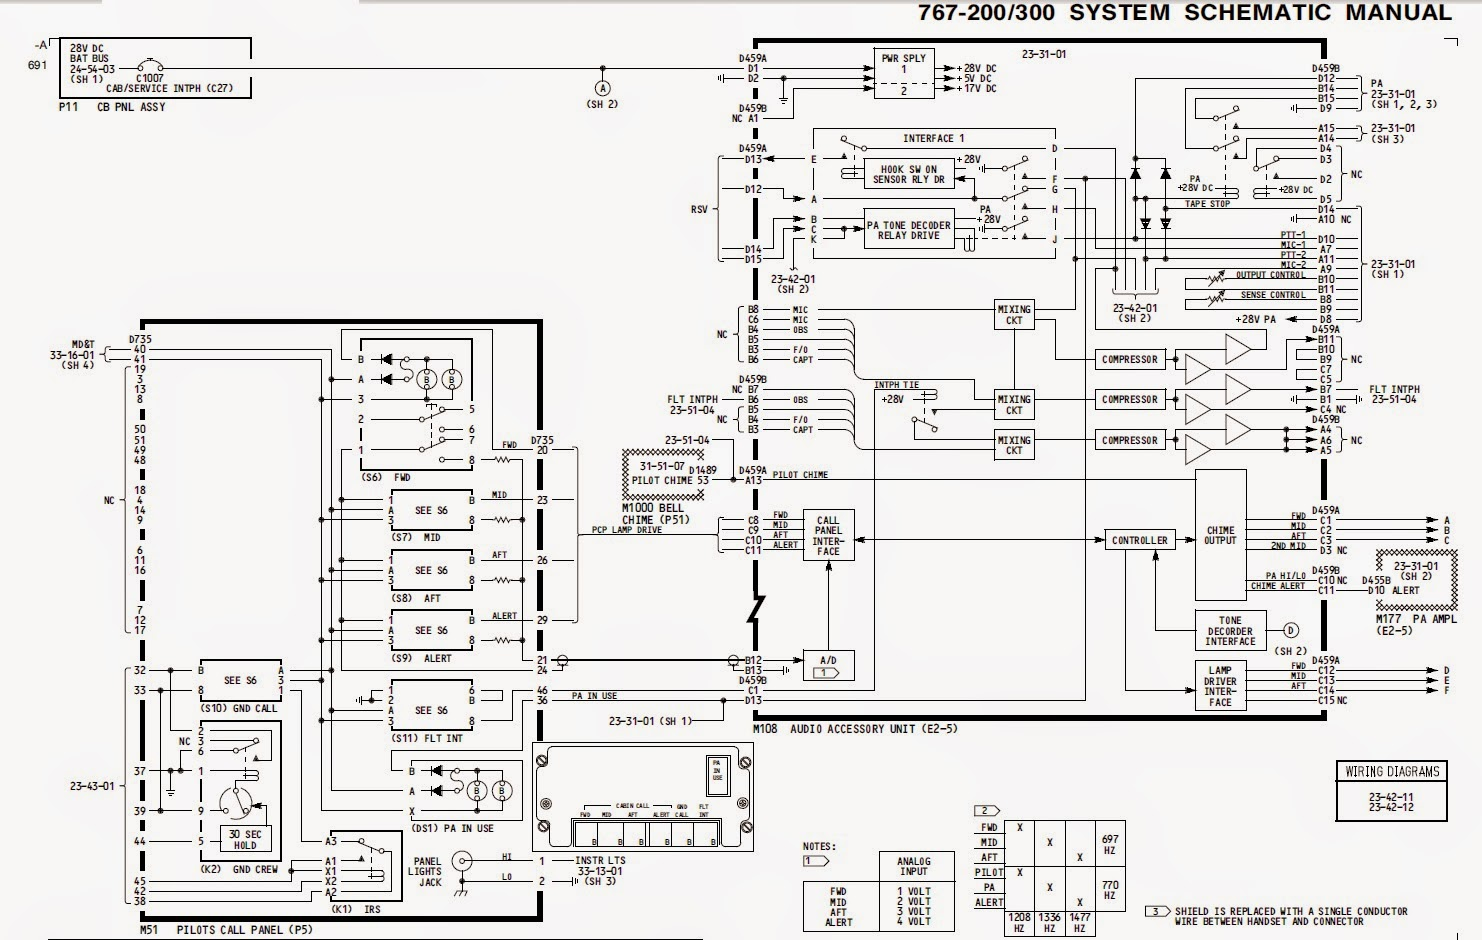 Avionics Wiring Diagram Symbols Conventional Smoke Detector Aviation Schematic Diagrams Auto Fuse Box